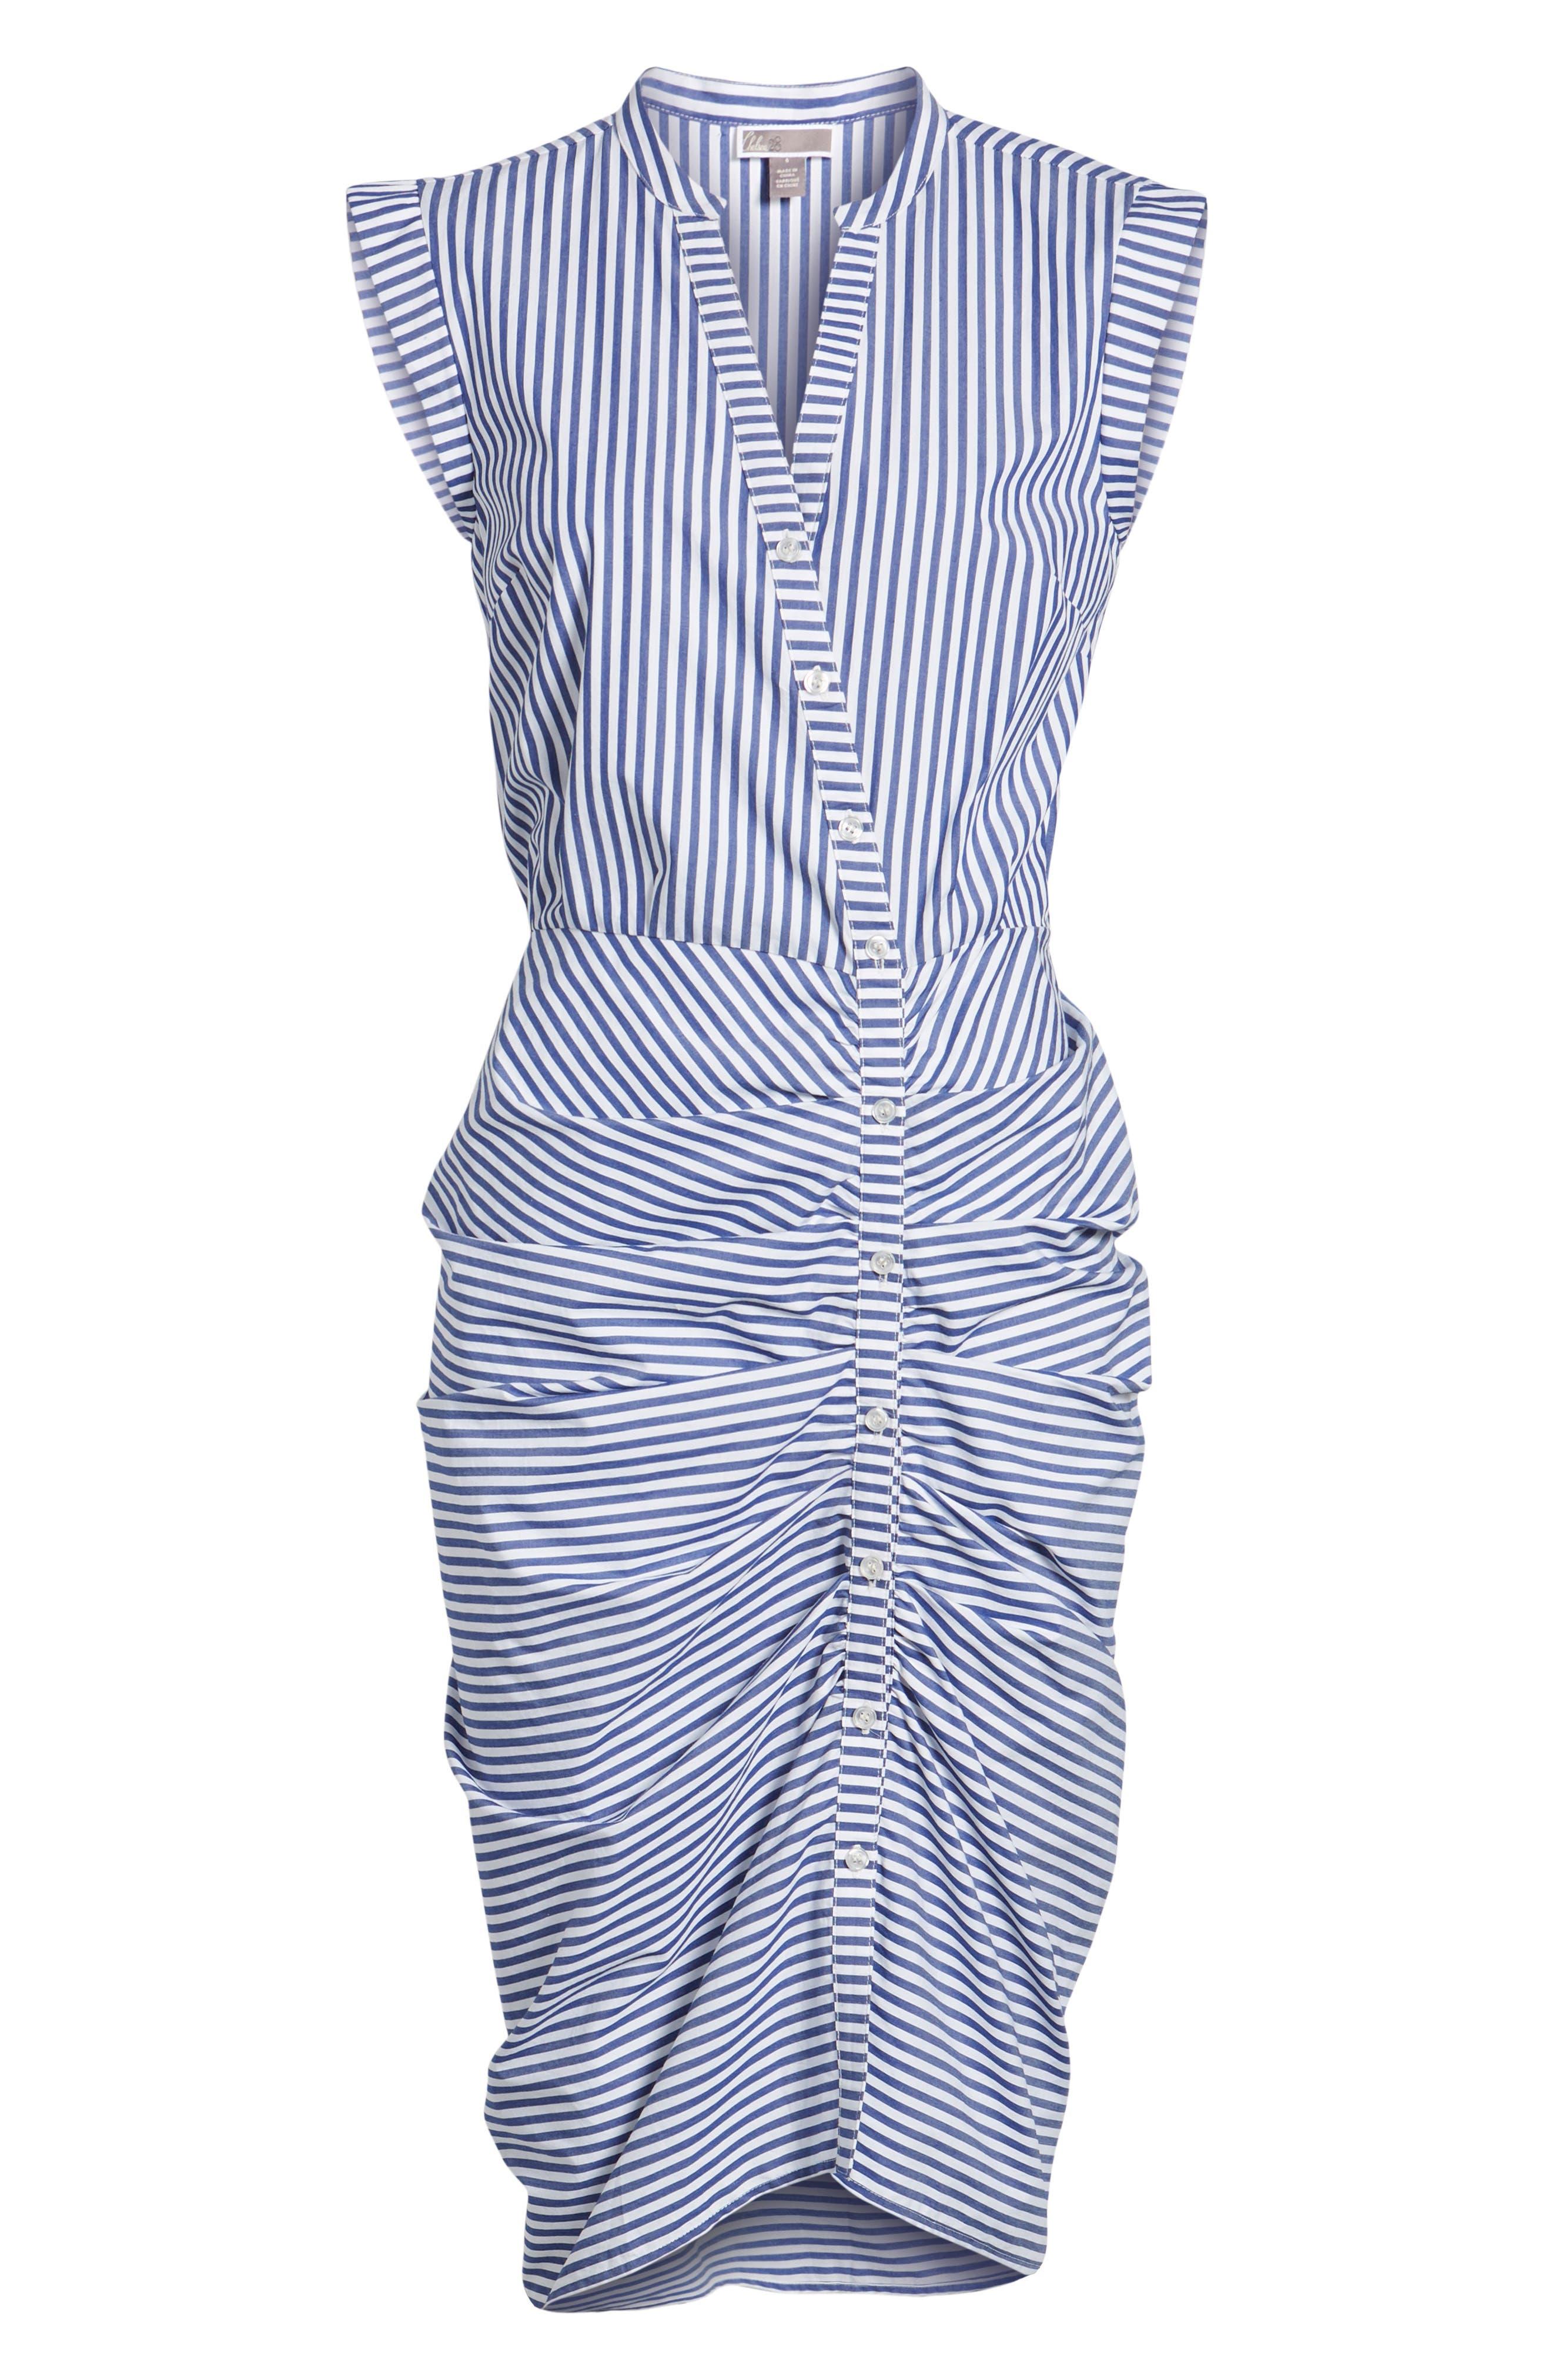 Stripe Ruched Cotton Shirtdress,                             Alternate thumbnail 13, color,                             Blue White Stripe